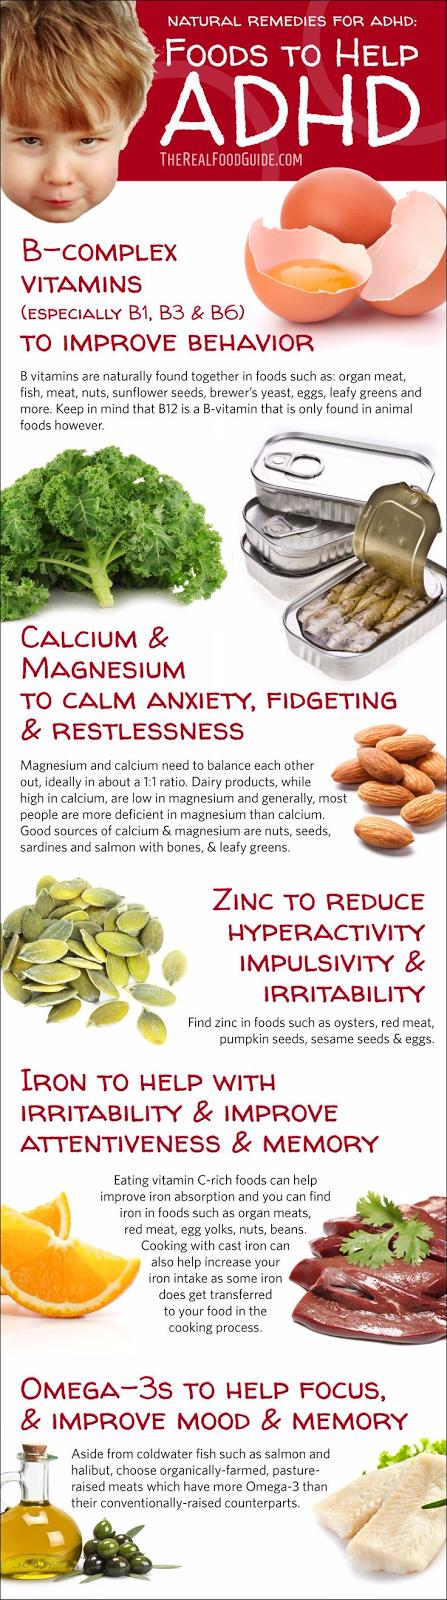 Natural remedies for ADHD: Vitamins for ADHD